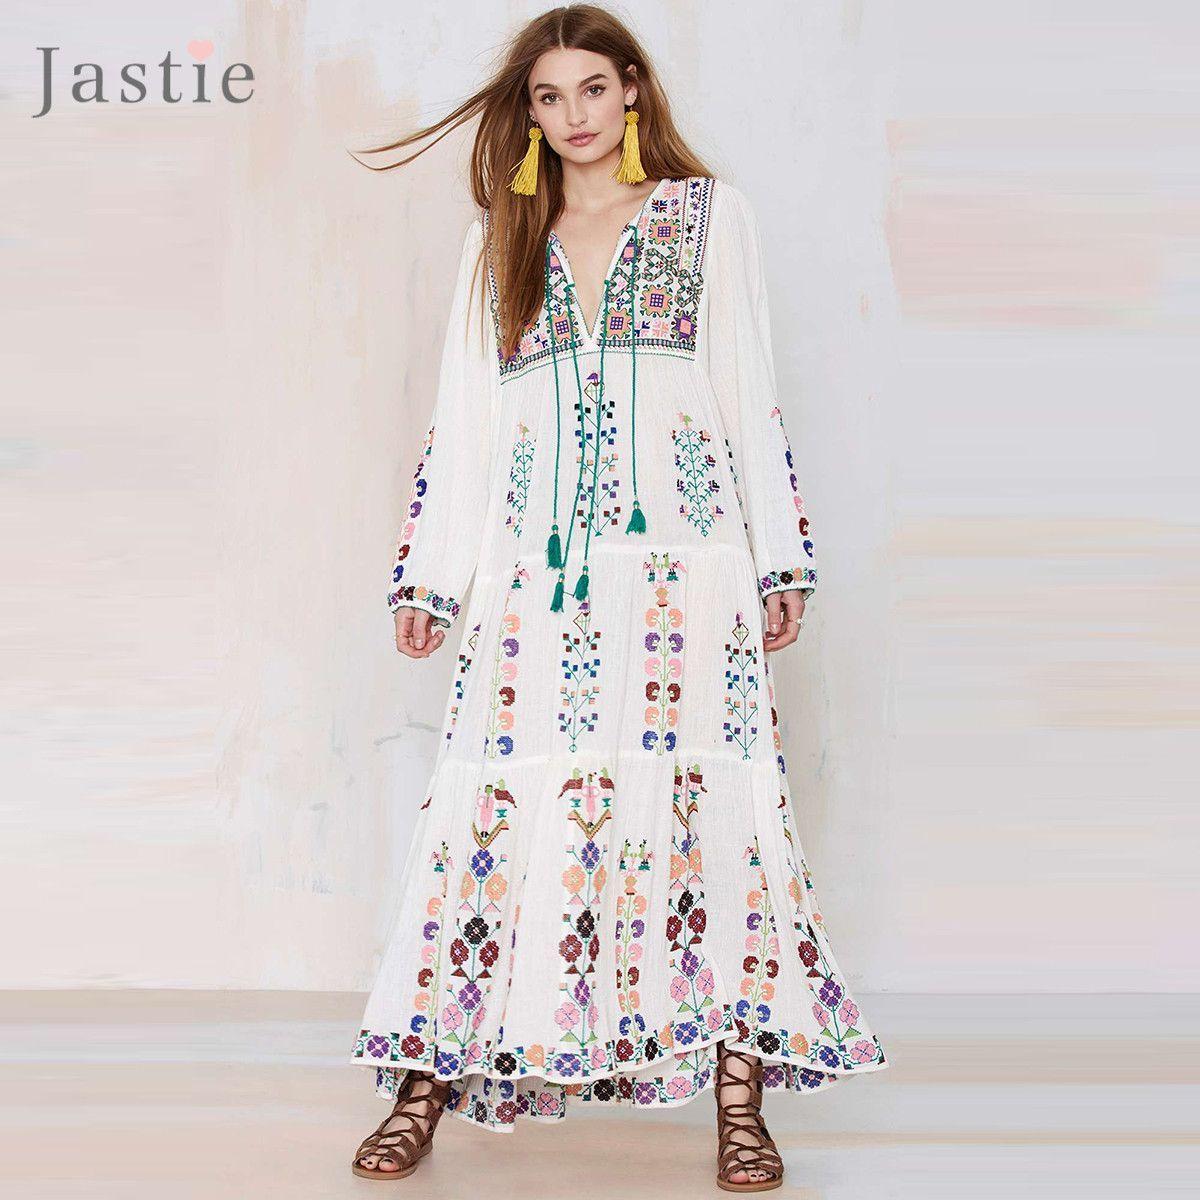 6810fae0add Jastie Floral Embroidered Maxi Dress Tassel V-Neck Long Sleeve Summer Dress  Vintage Boho Chic Beach Style Dresses Vestidos